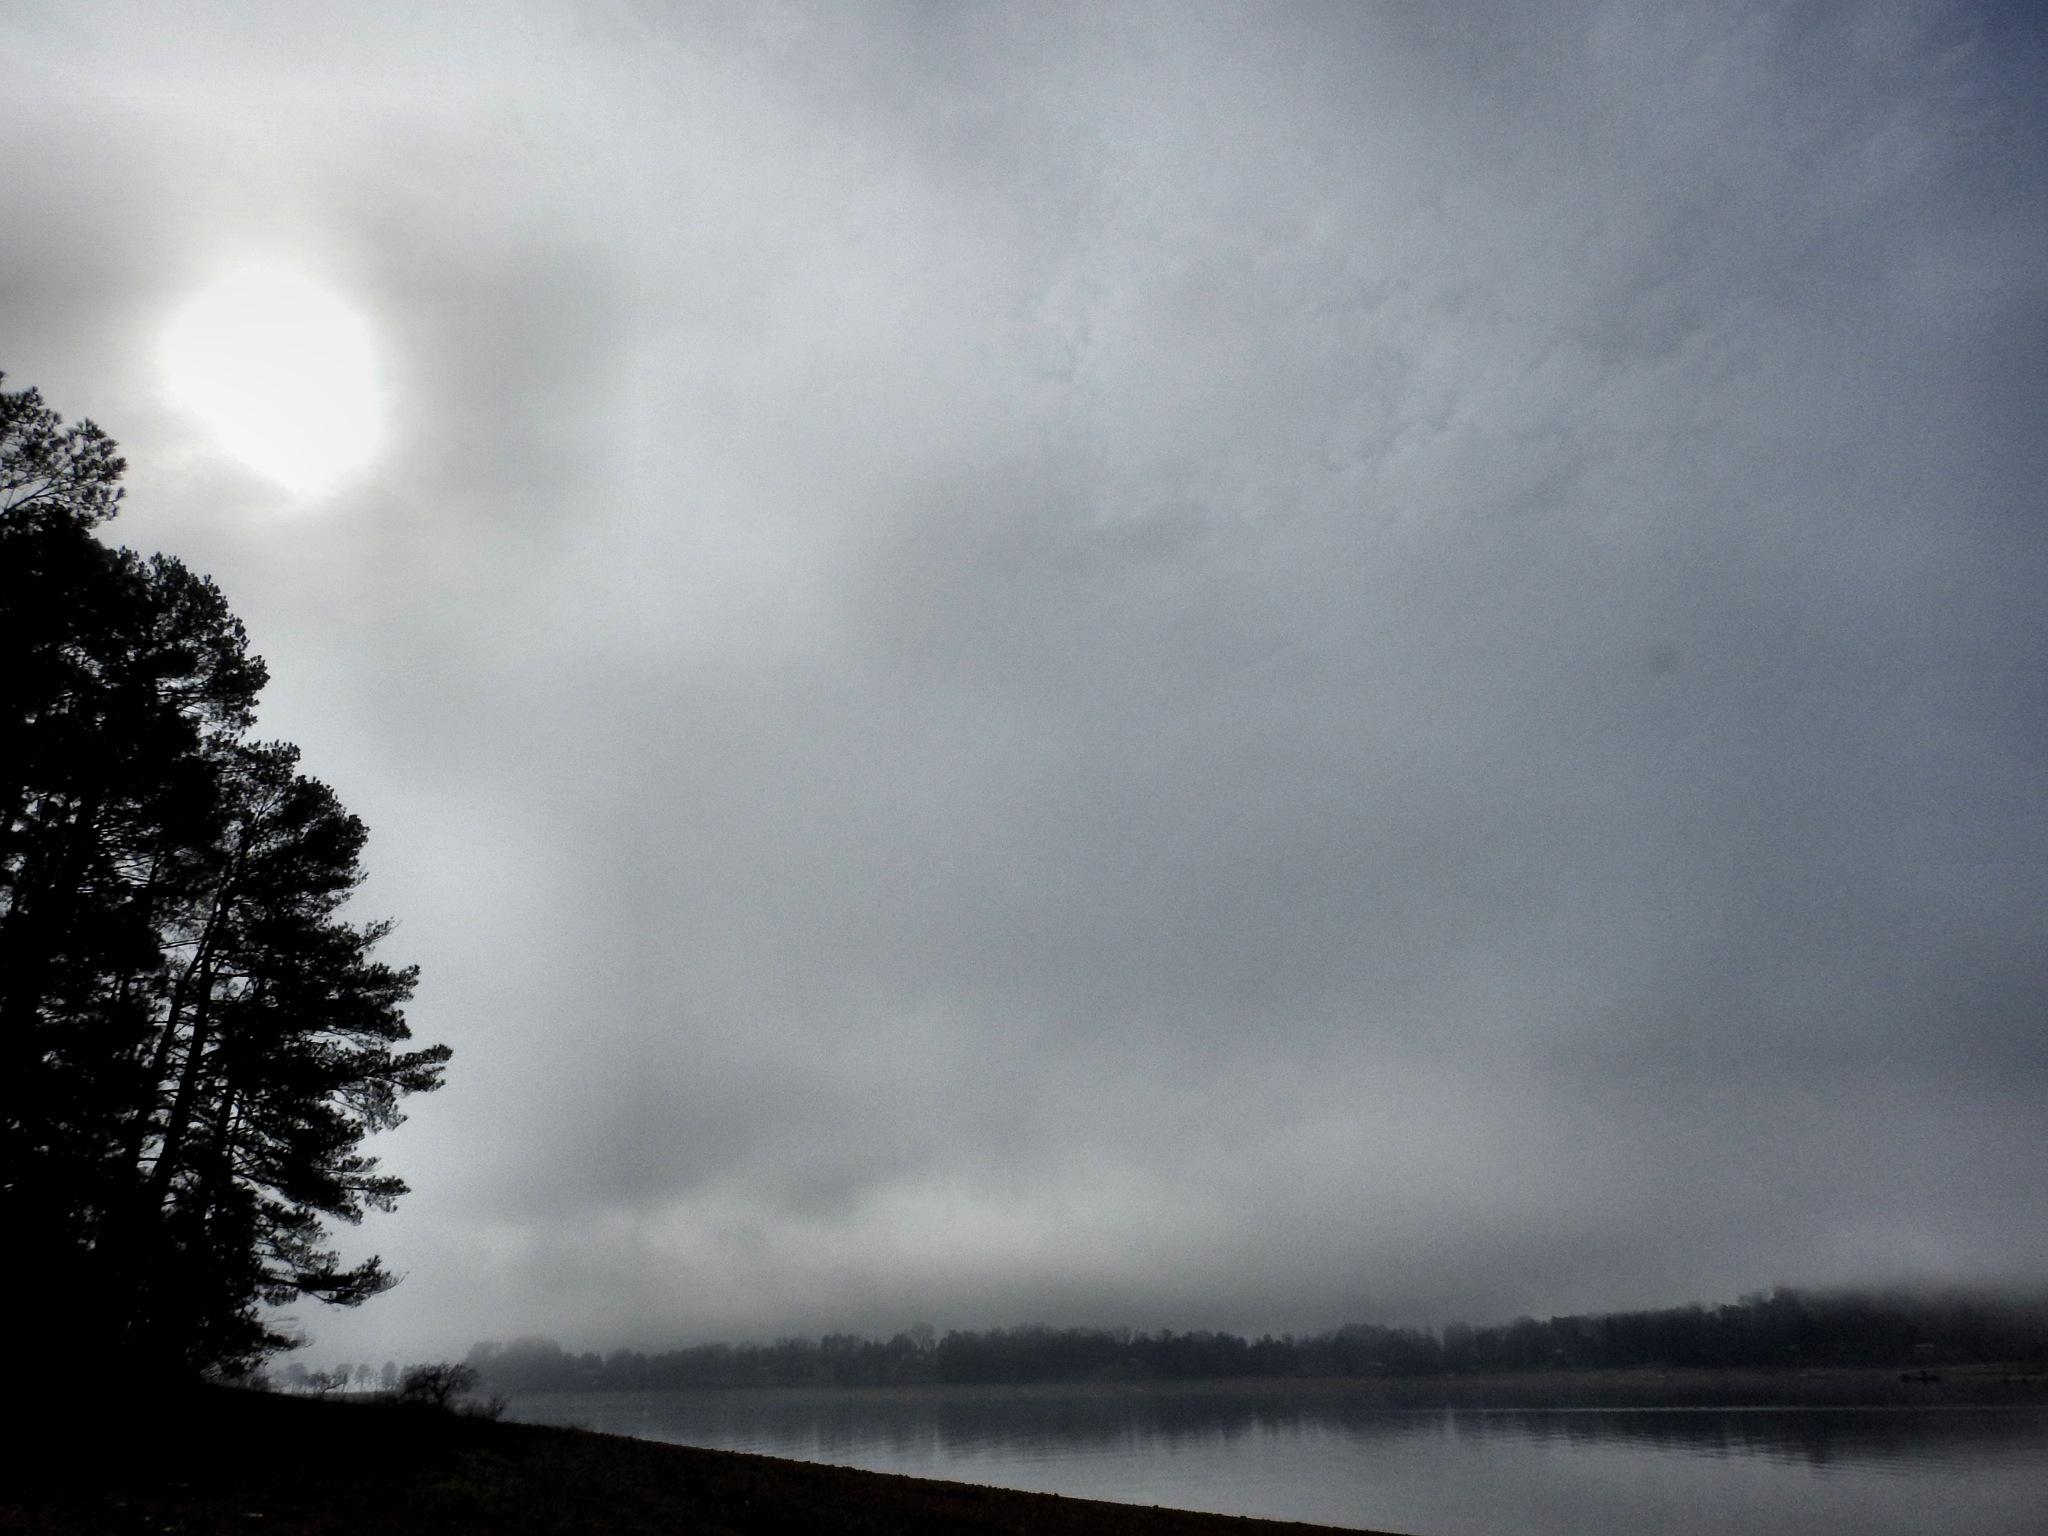 Morning Lake Fog by Patty Stockton